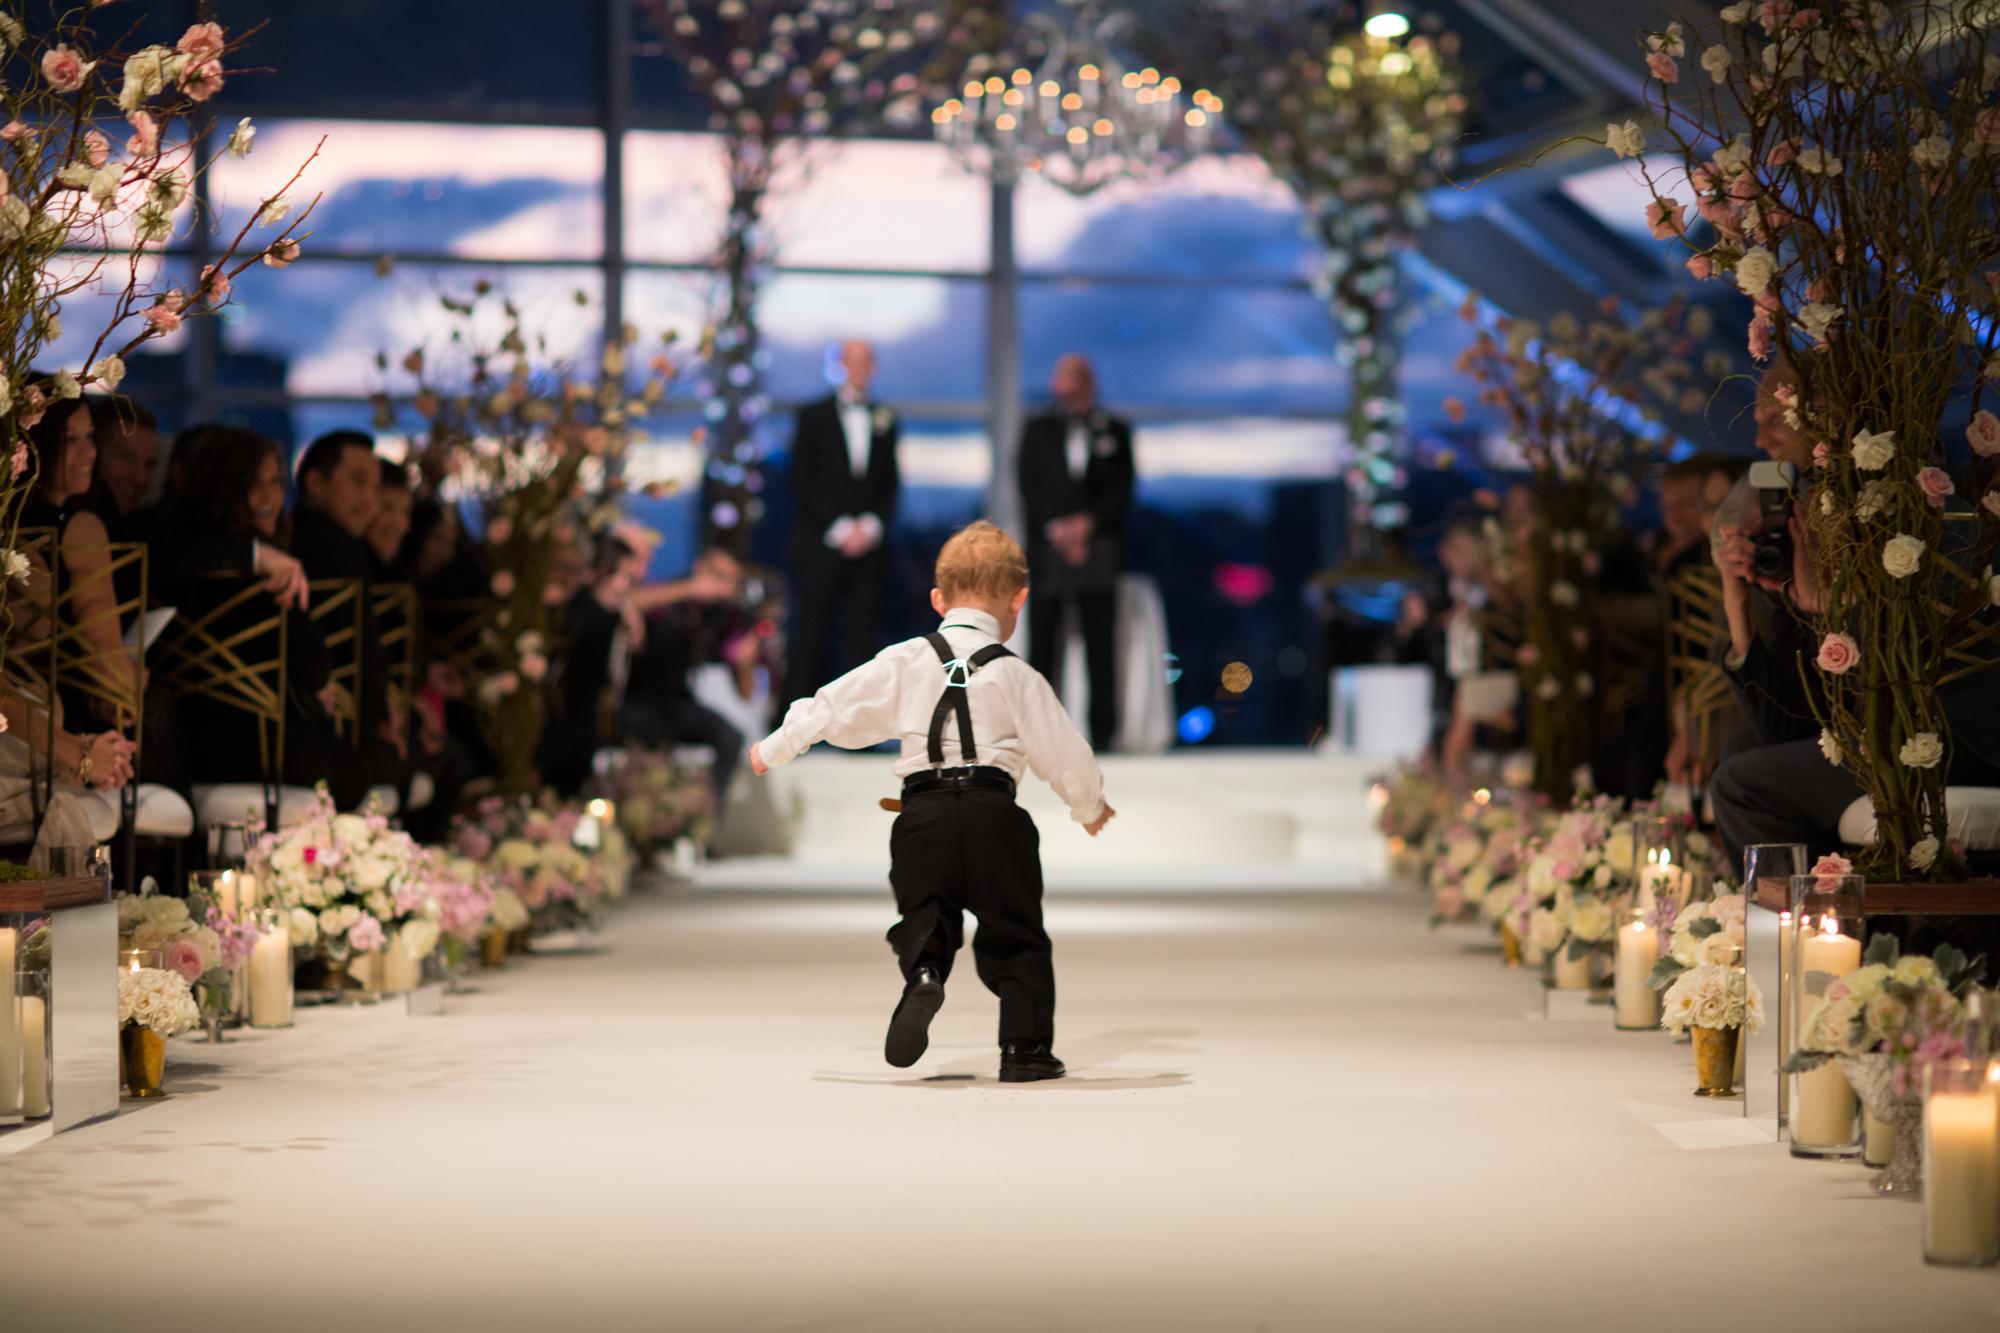 Documentary wedding photography at Adler Planetarium in Chicago